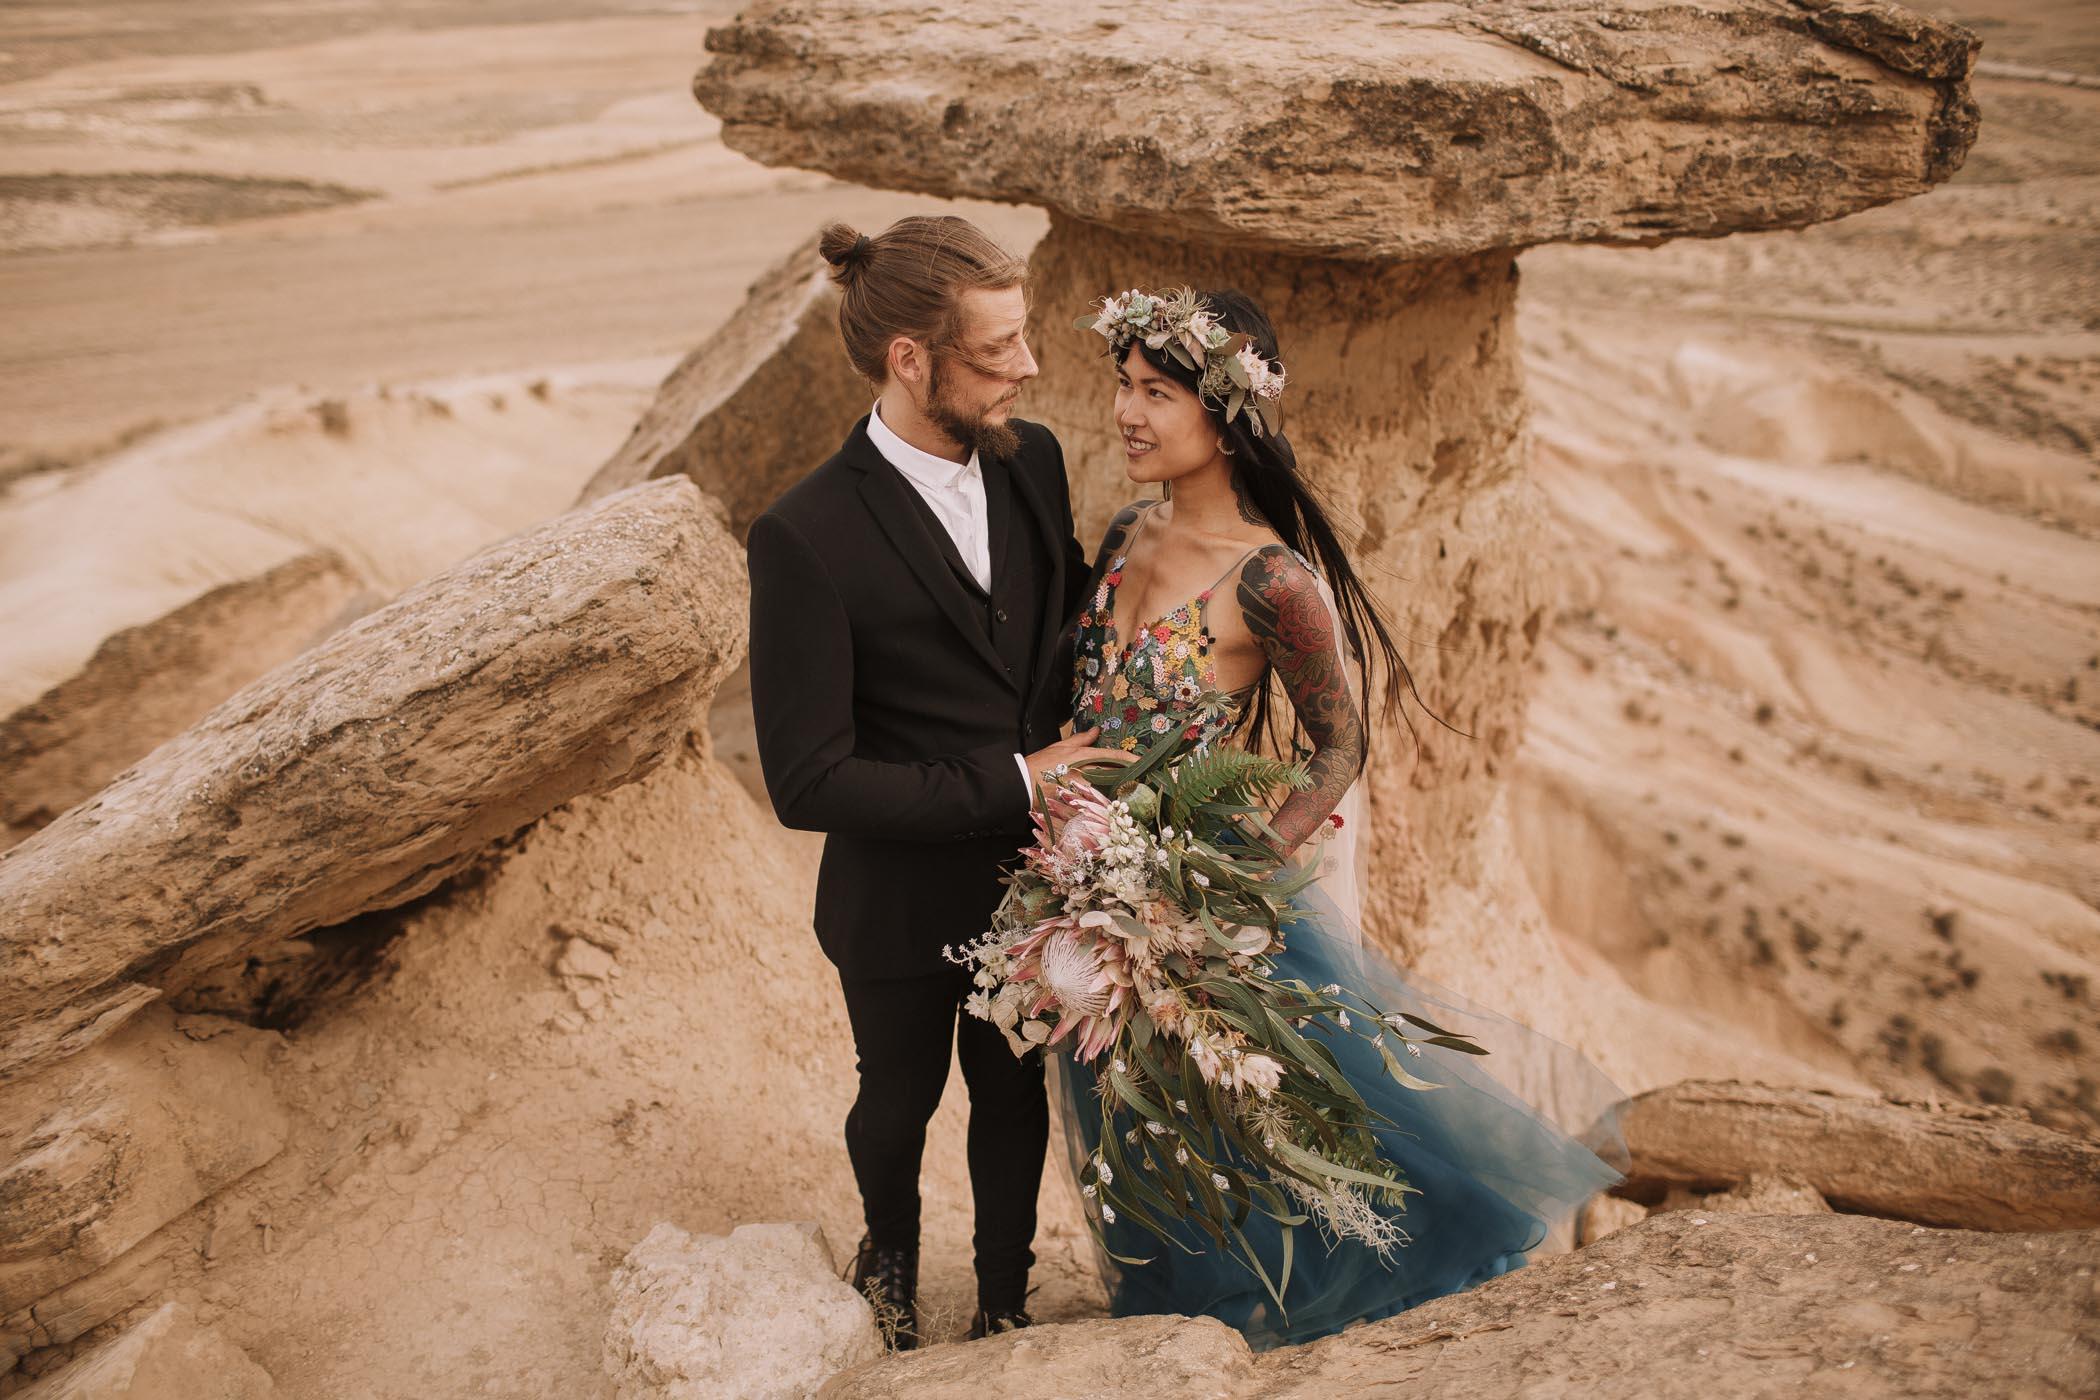 Photographe-mariage-bordeaux-jeremy-boyer-12.jpg